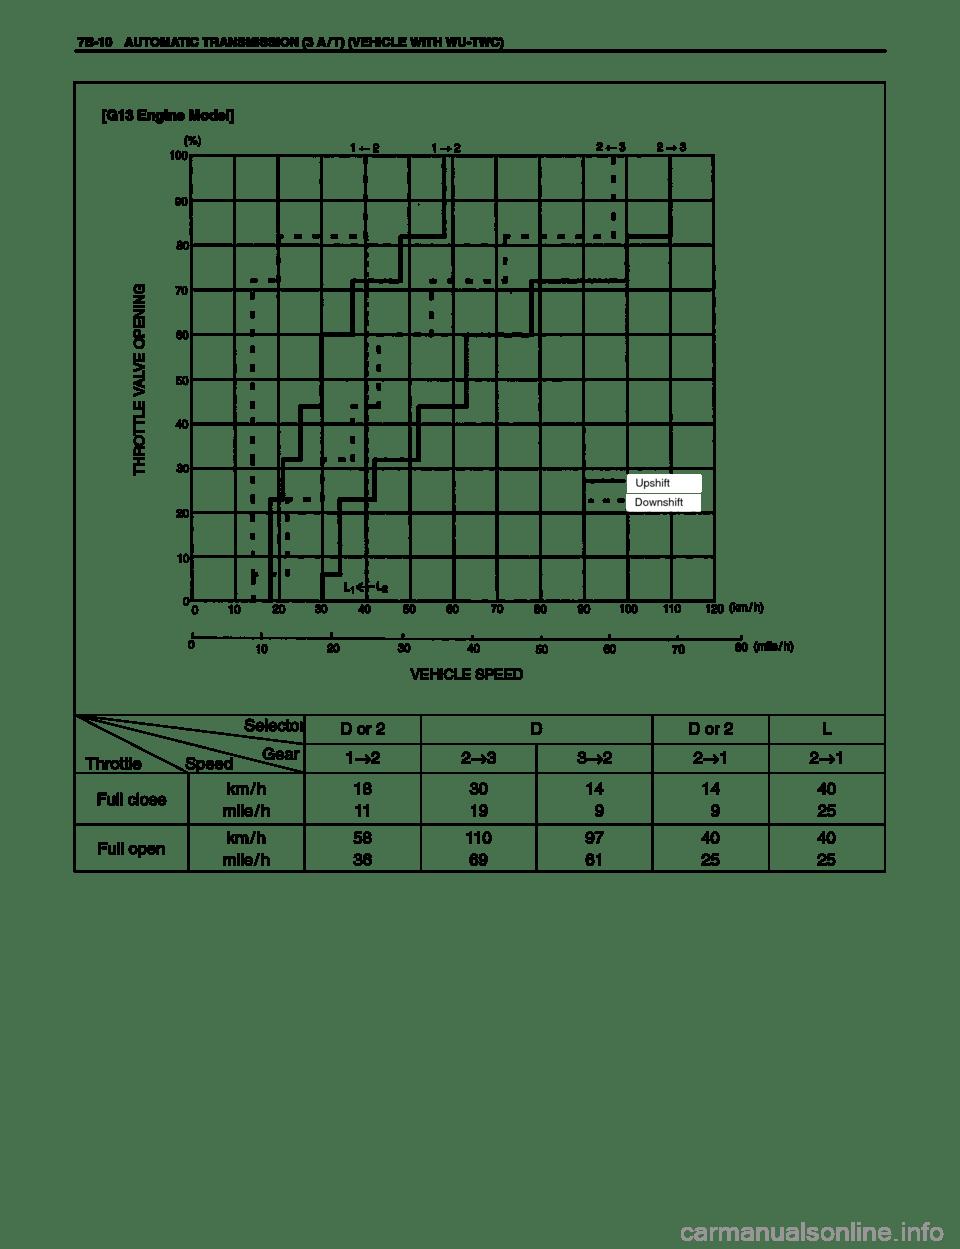 SUZUKI SWIFT 2000 1.G SF310 Service Workshop Manual (557